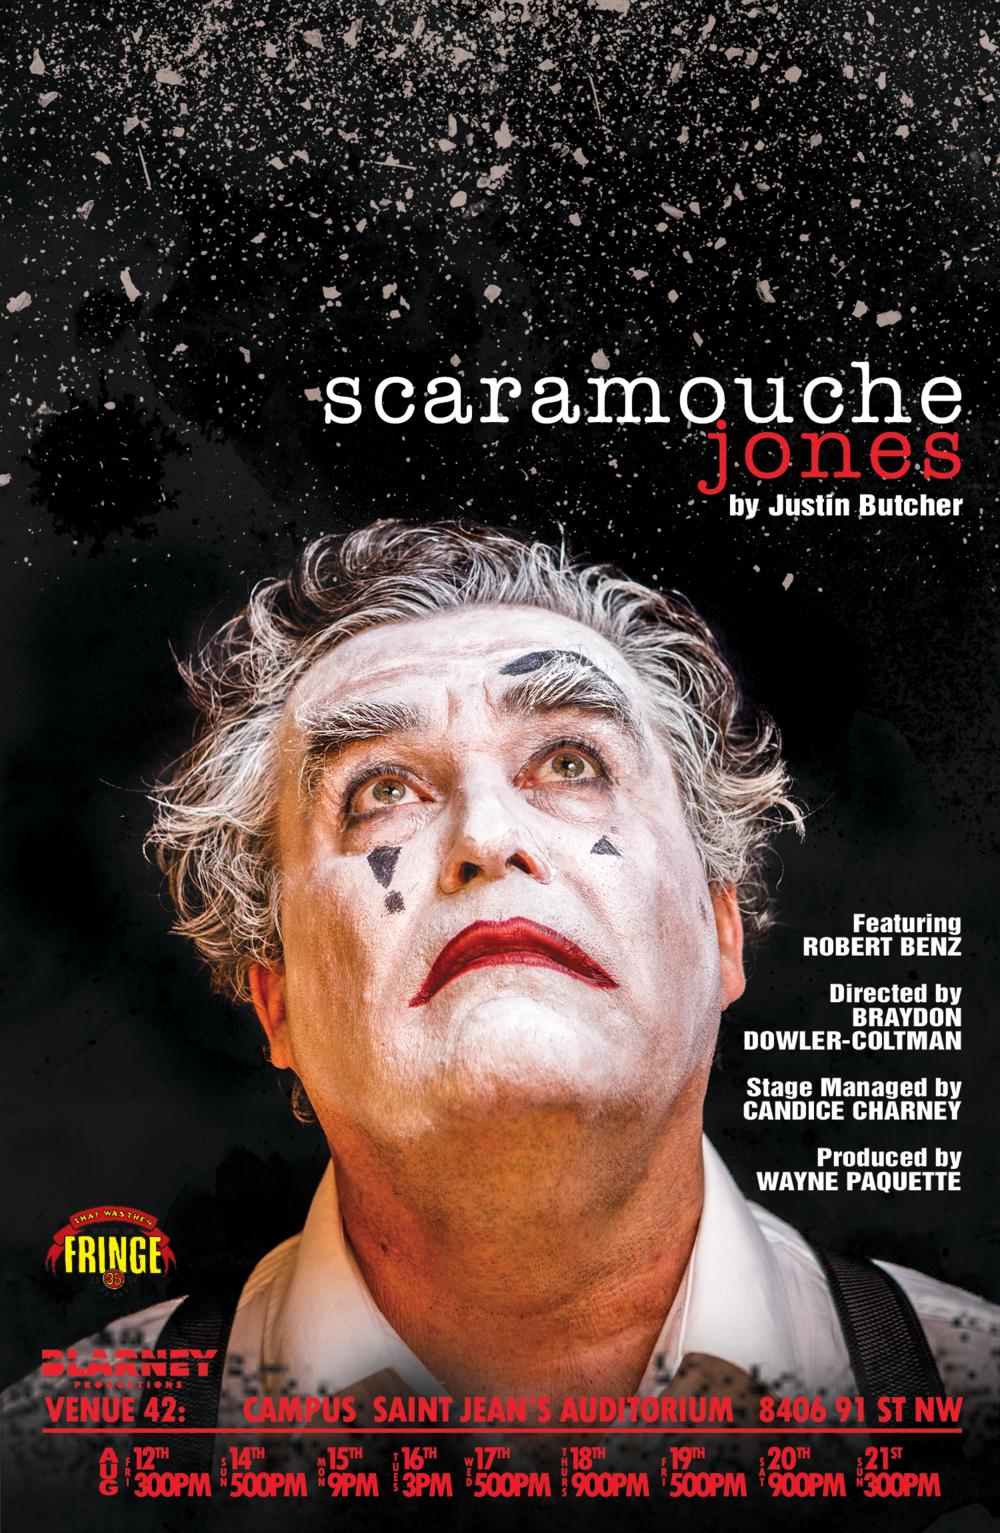 Scaramouche Jones - Poster 2 - Web.png